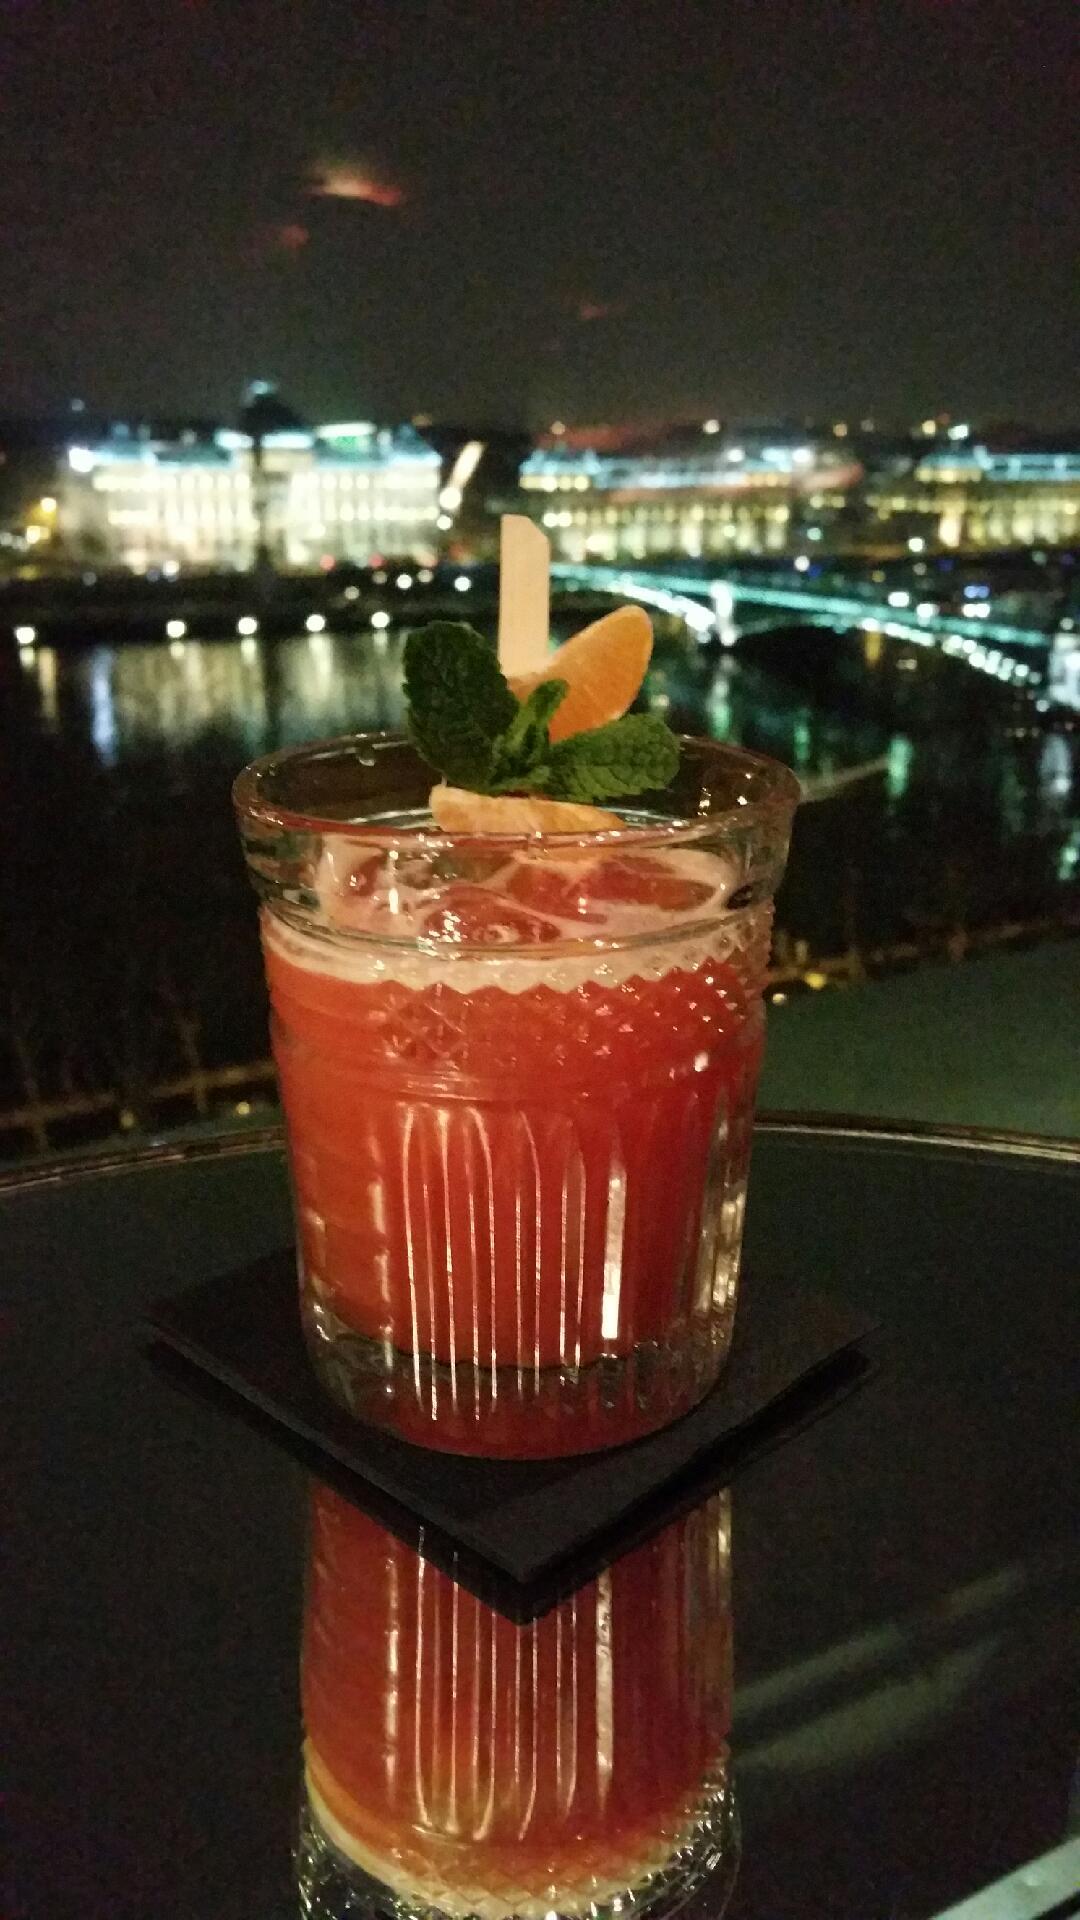 Bartenders at work by infosbar le cv express de julien borre for Cocktail 7cl